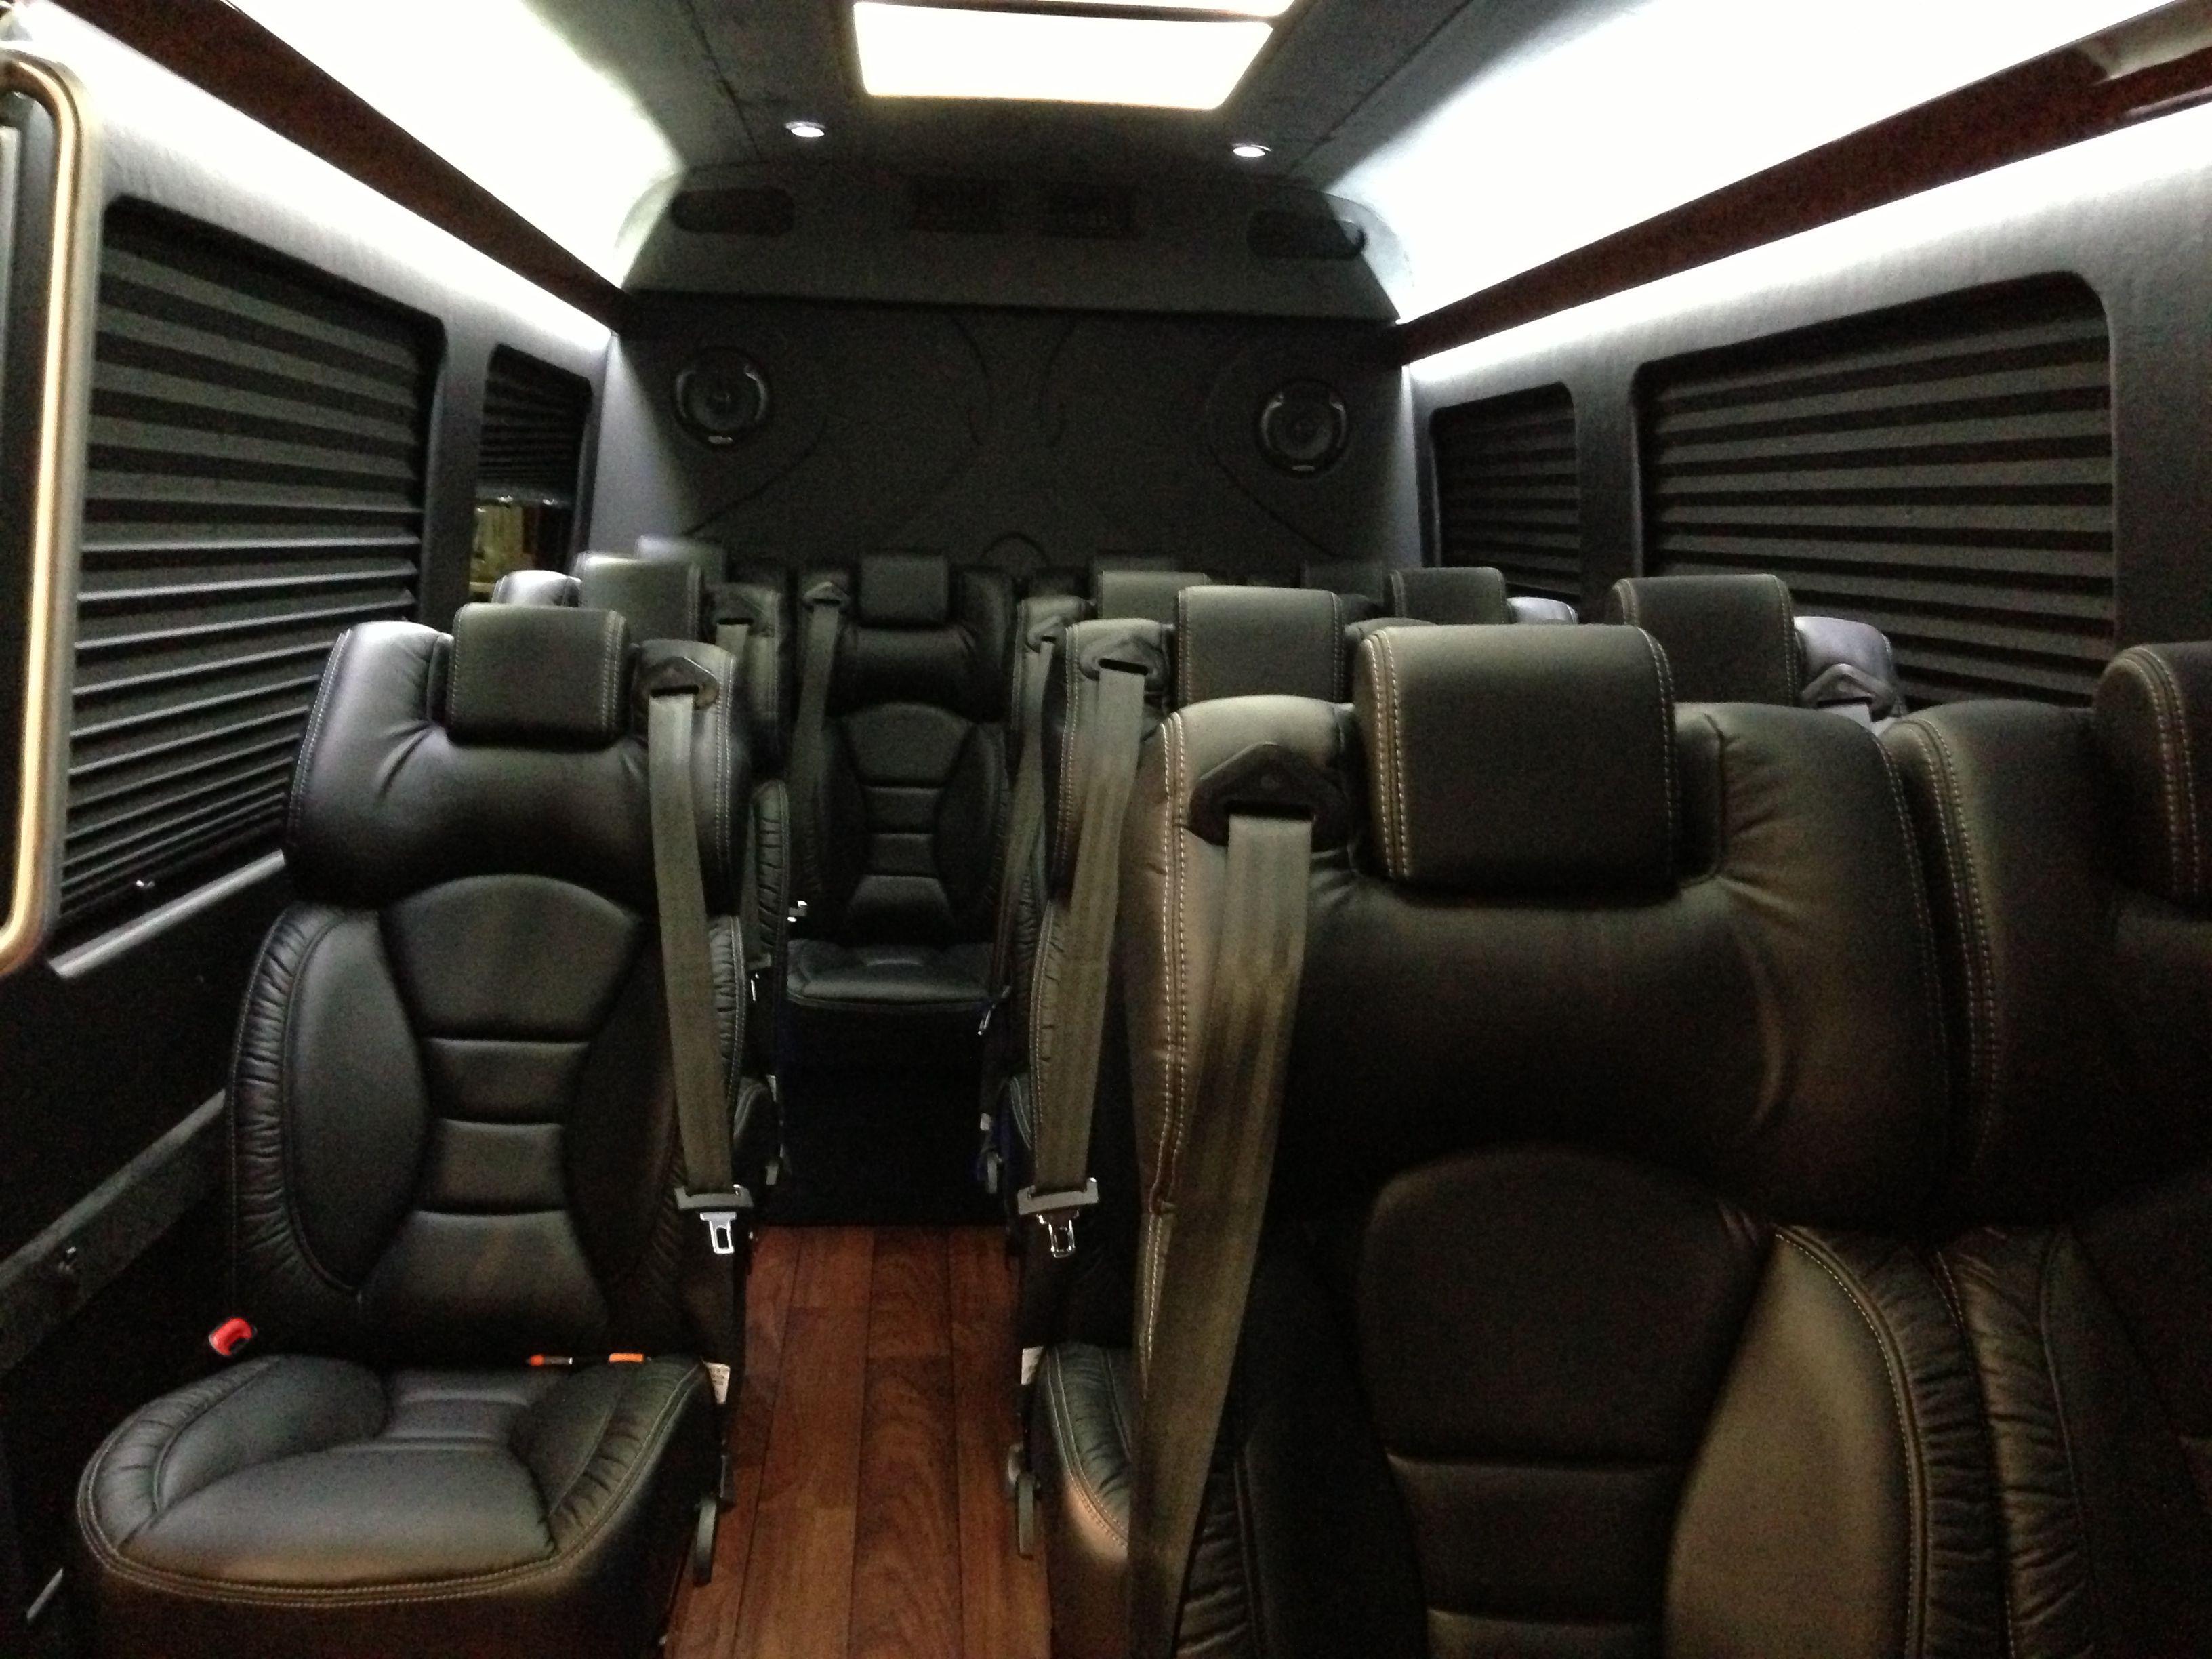 Mercedes sprinter mini bus interior inviting interiors for Mercedes benz van interior